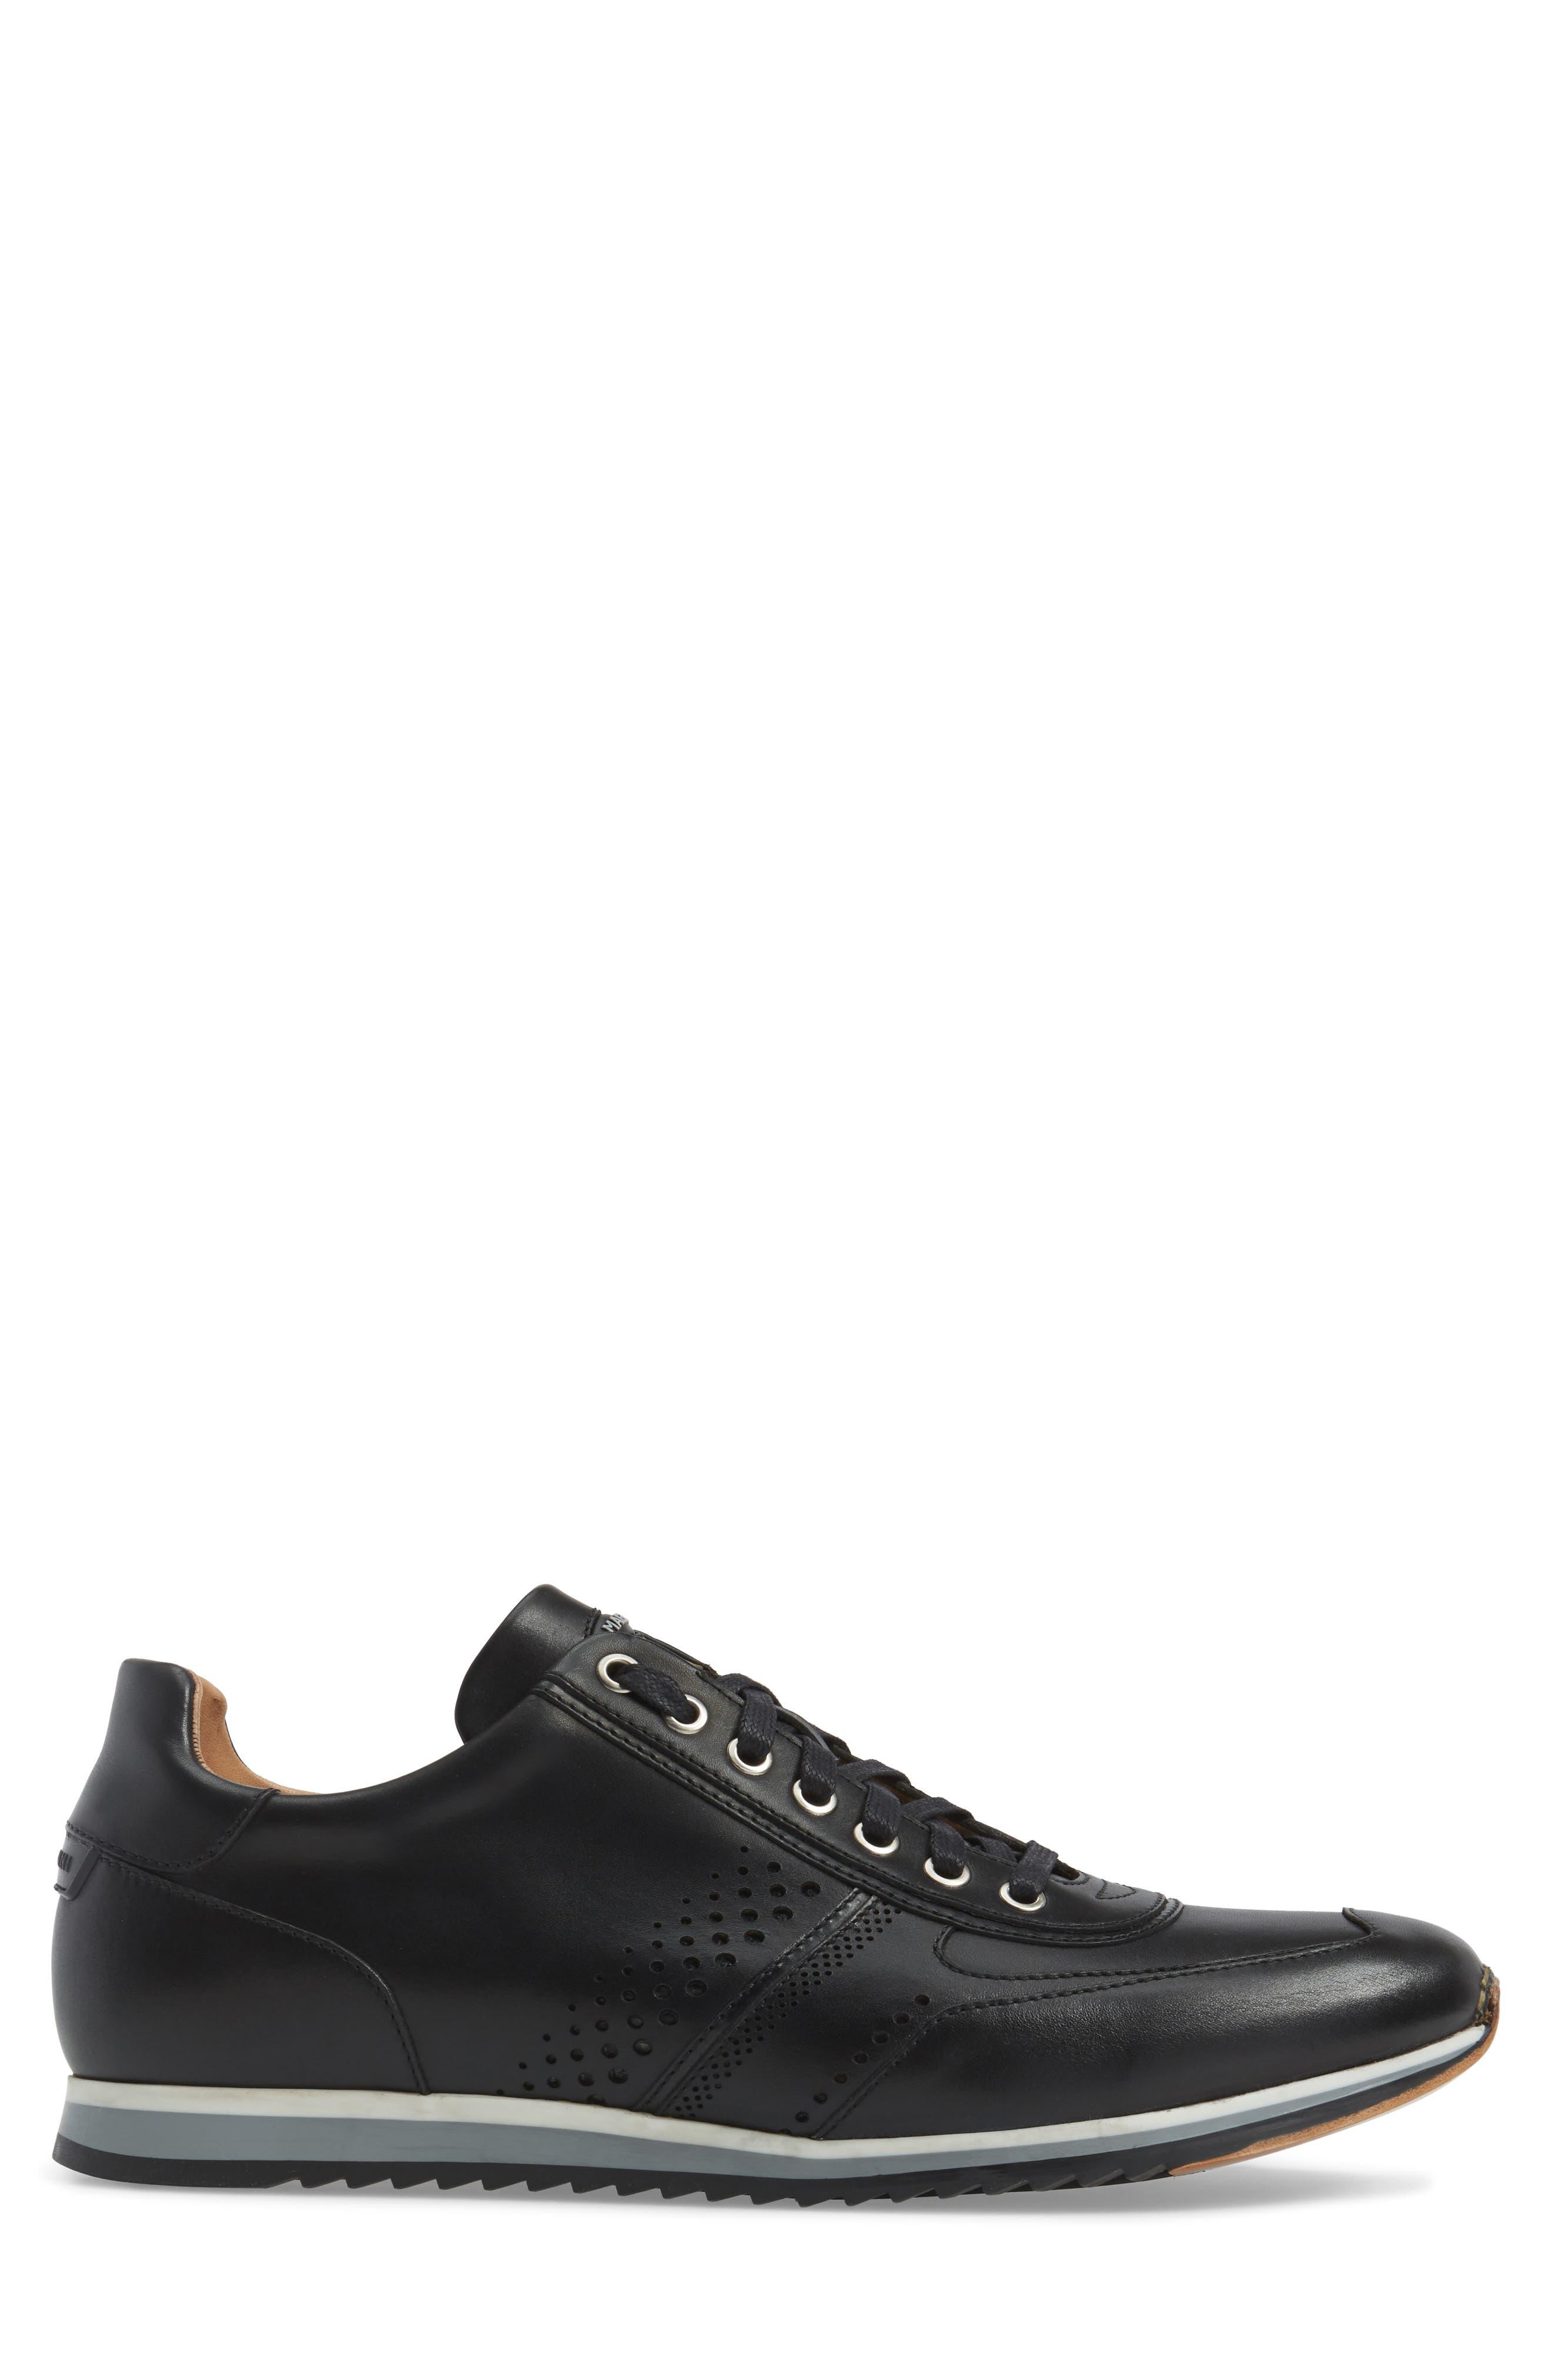 Alternate Image 3  - Magnanni 'Cristian' Sneaker (Men)